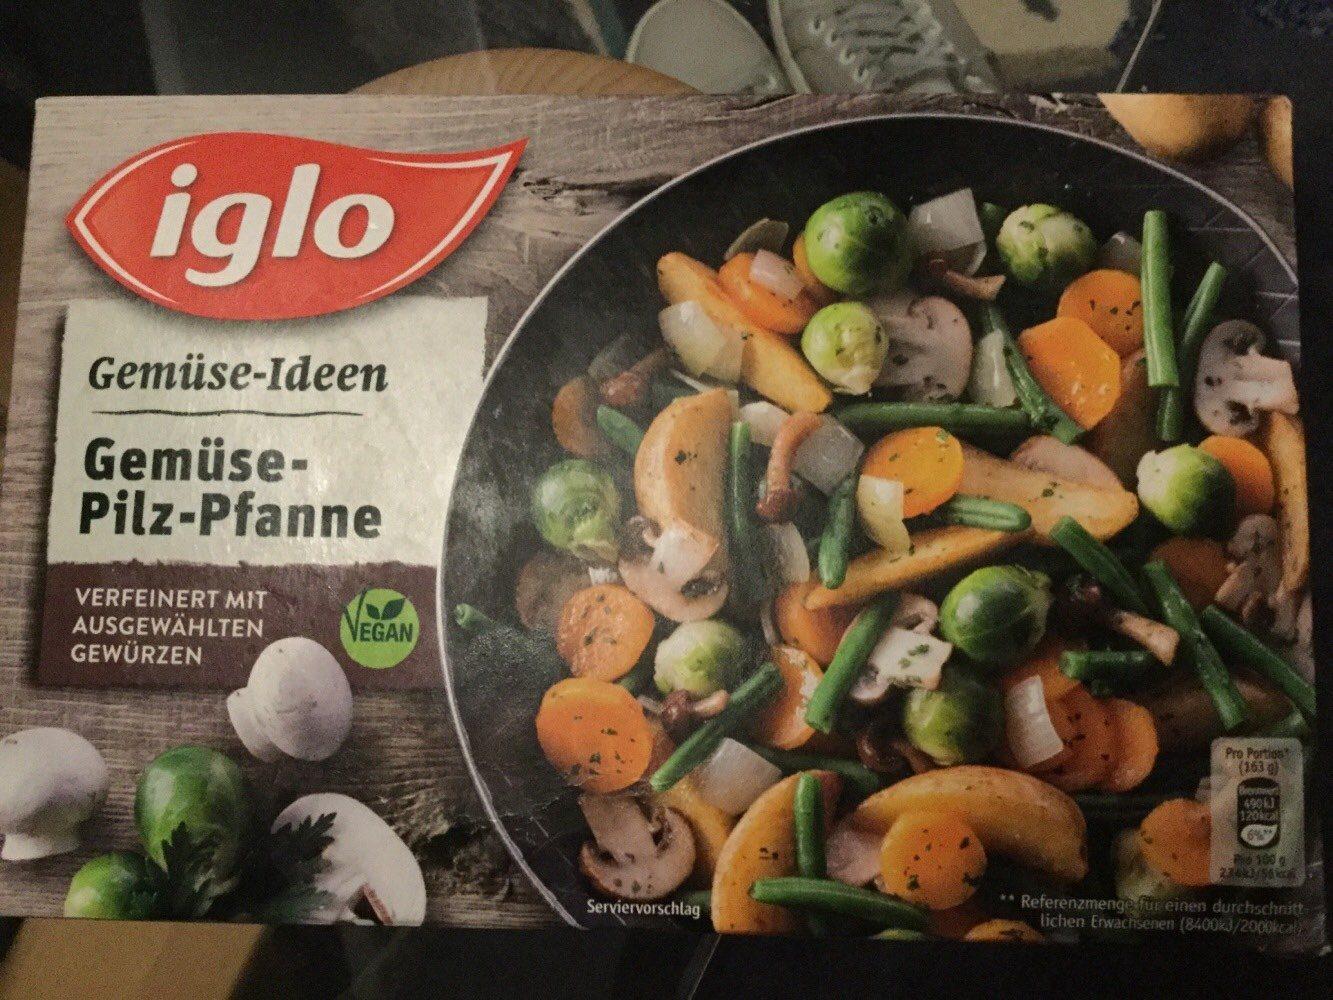 Gemüse-Ideen Gemüse-Pilz Pfanne - Prodotto - de